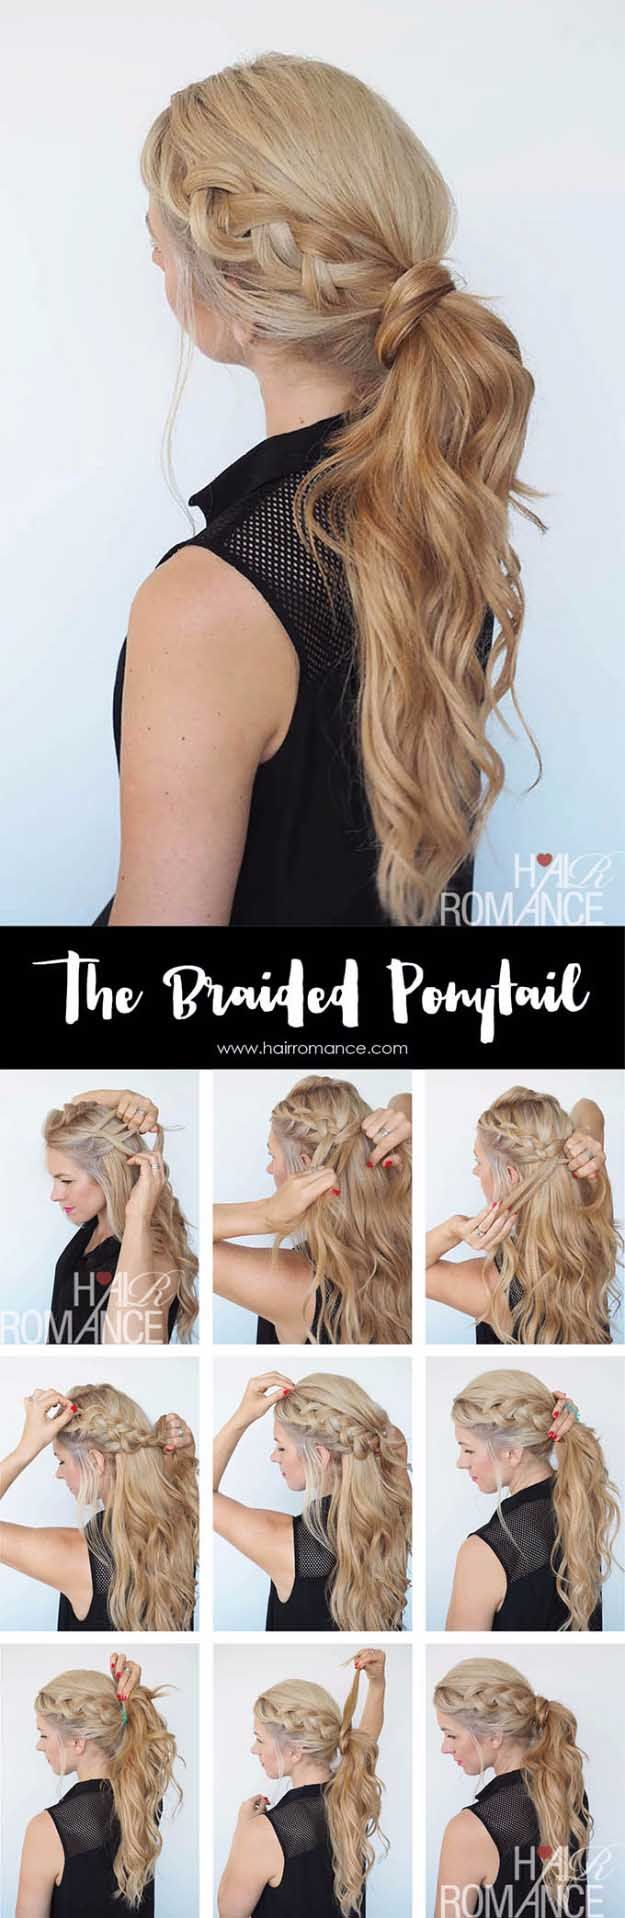 glam ponytail tutorials braided ponytail hairstyle